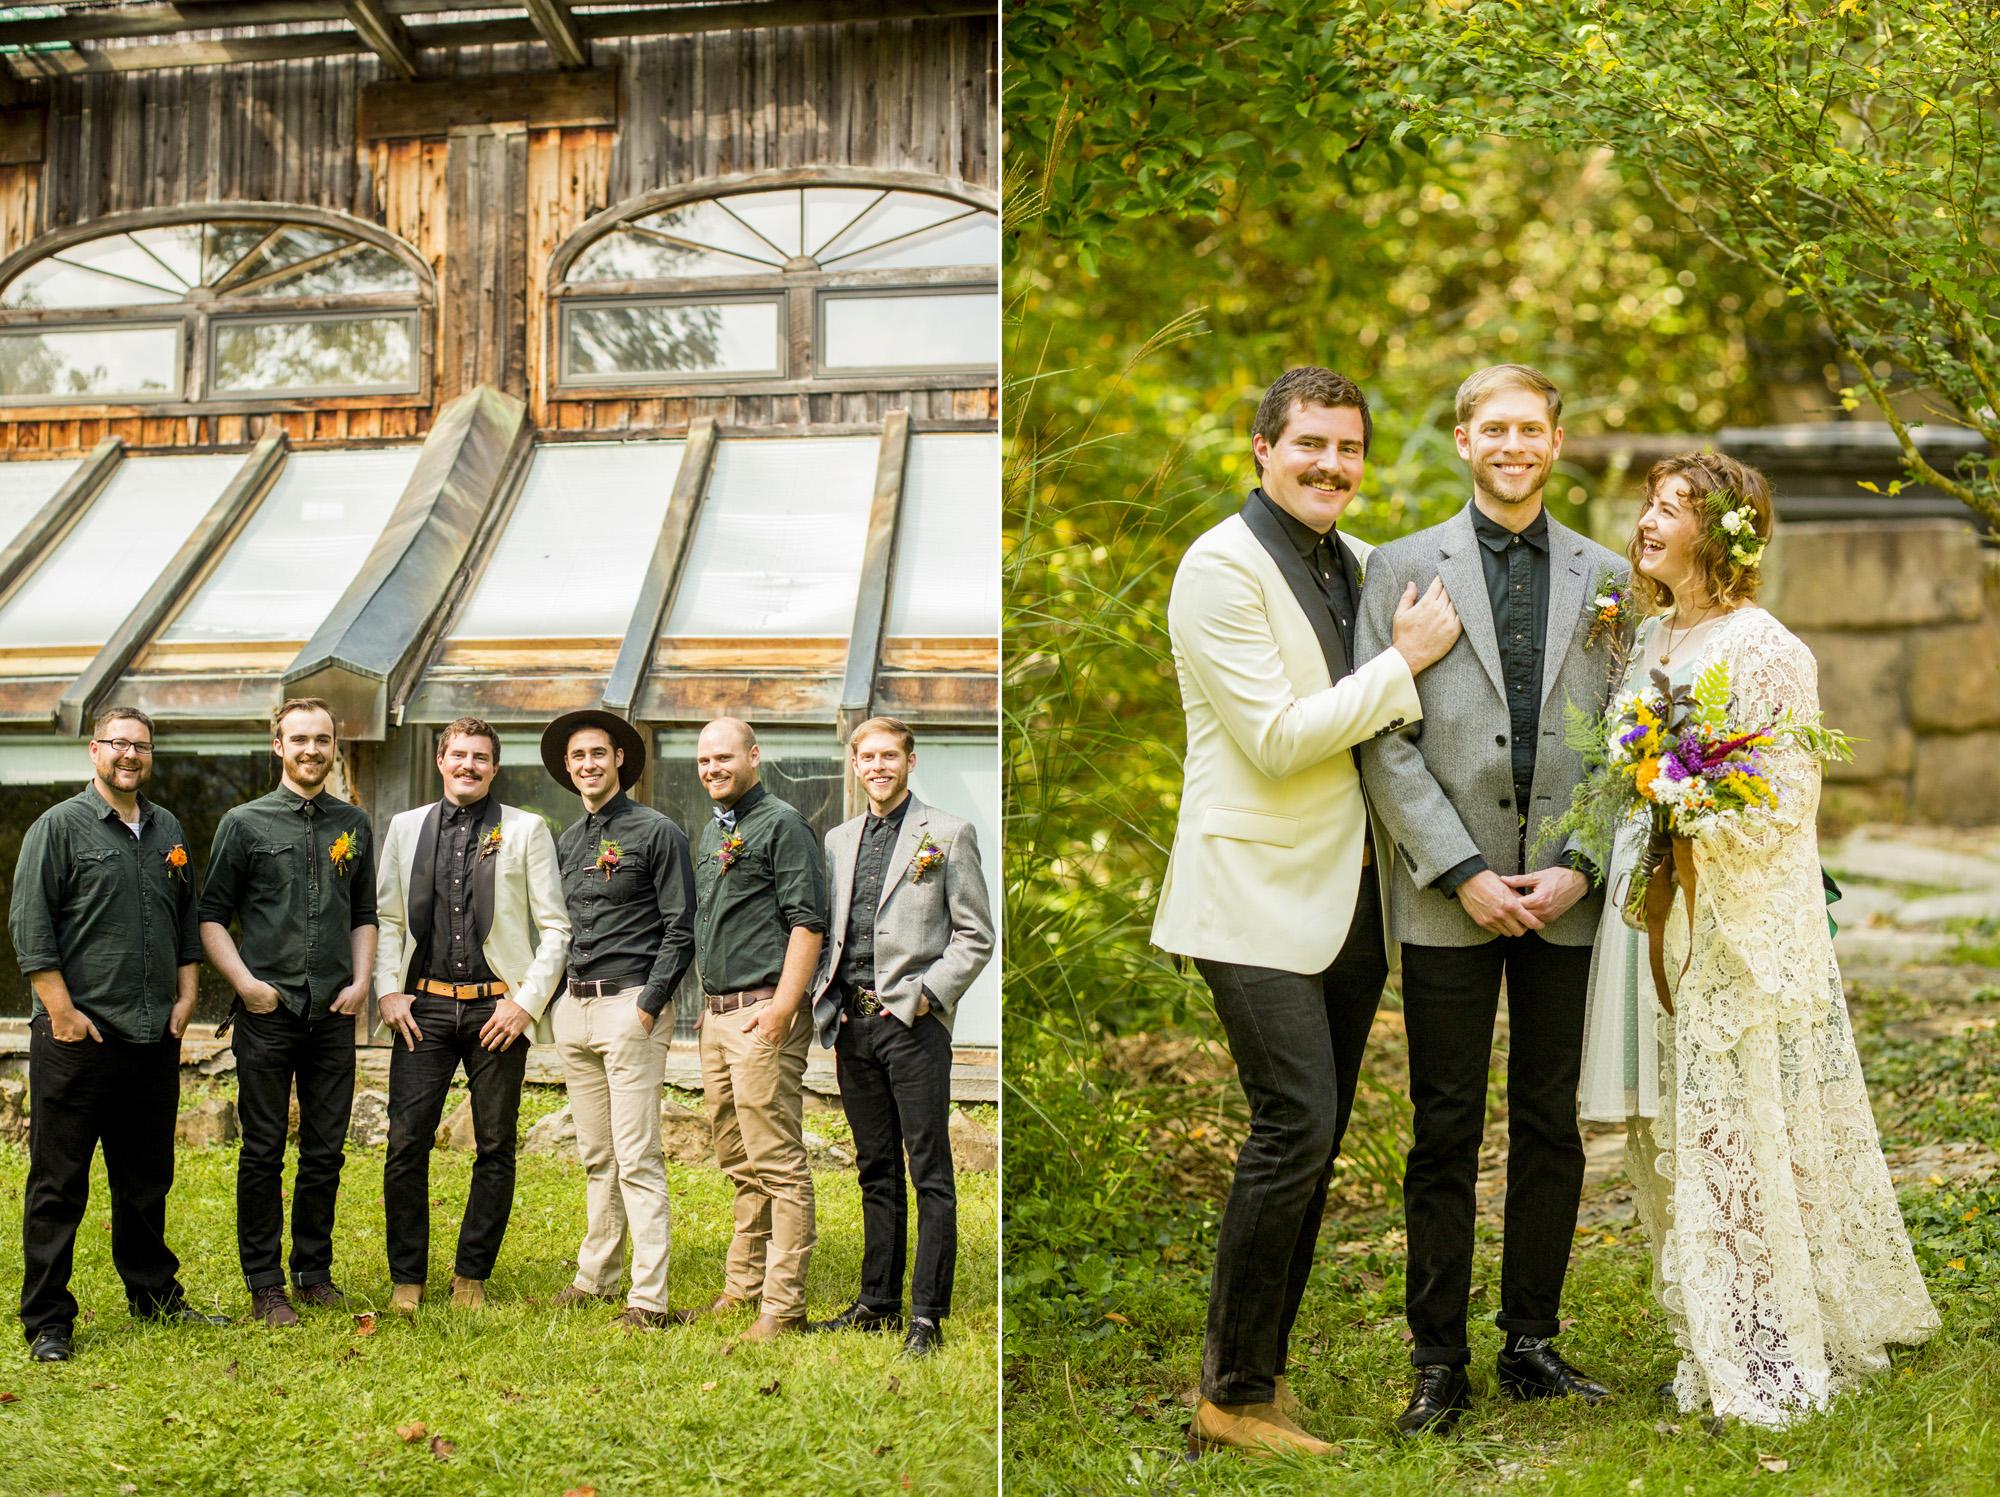 Seriously_Sabrina_Photography_Red_River_Gorge_Kentucky_Wedding_ShawnDana88.jpg